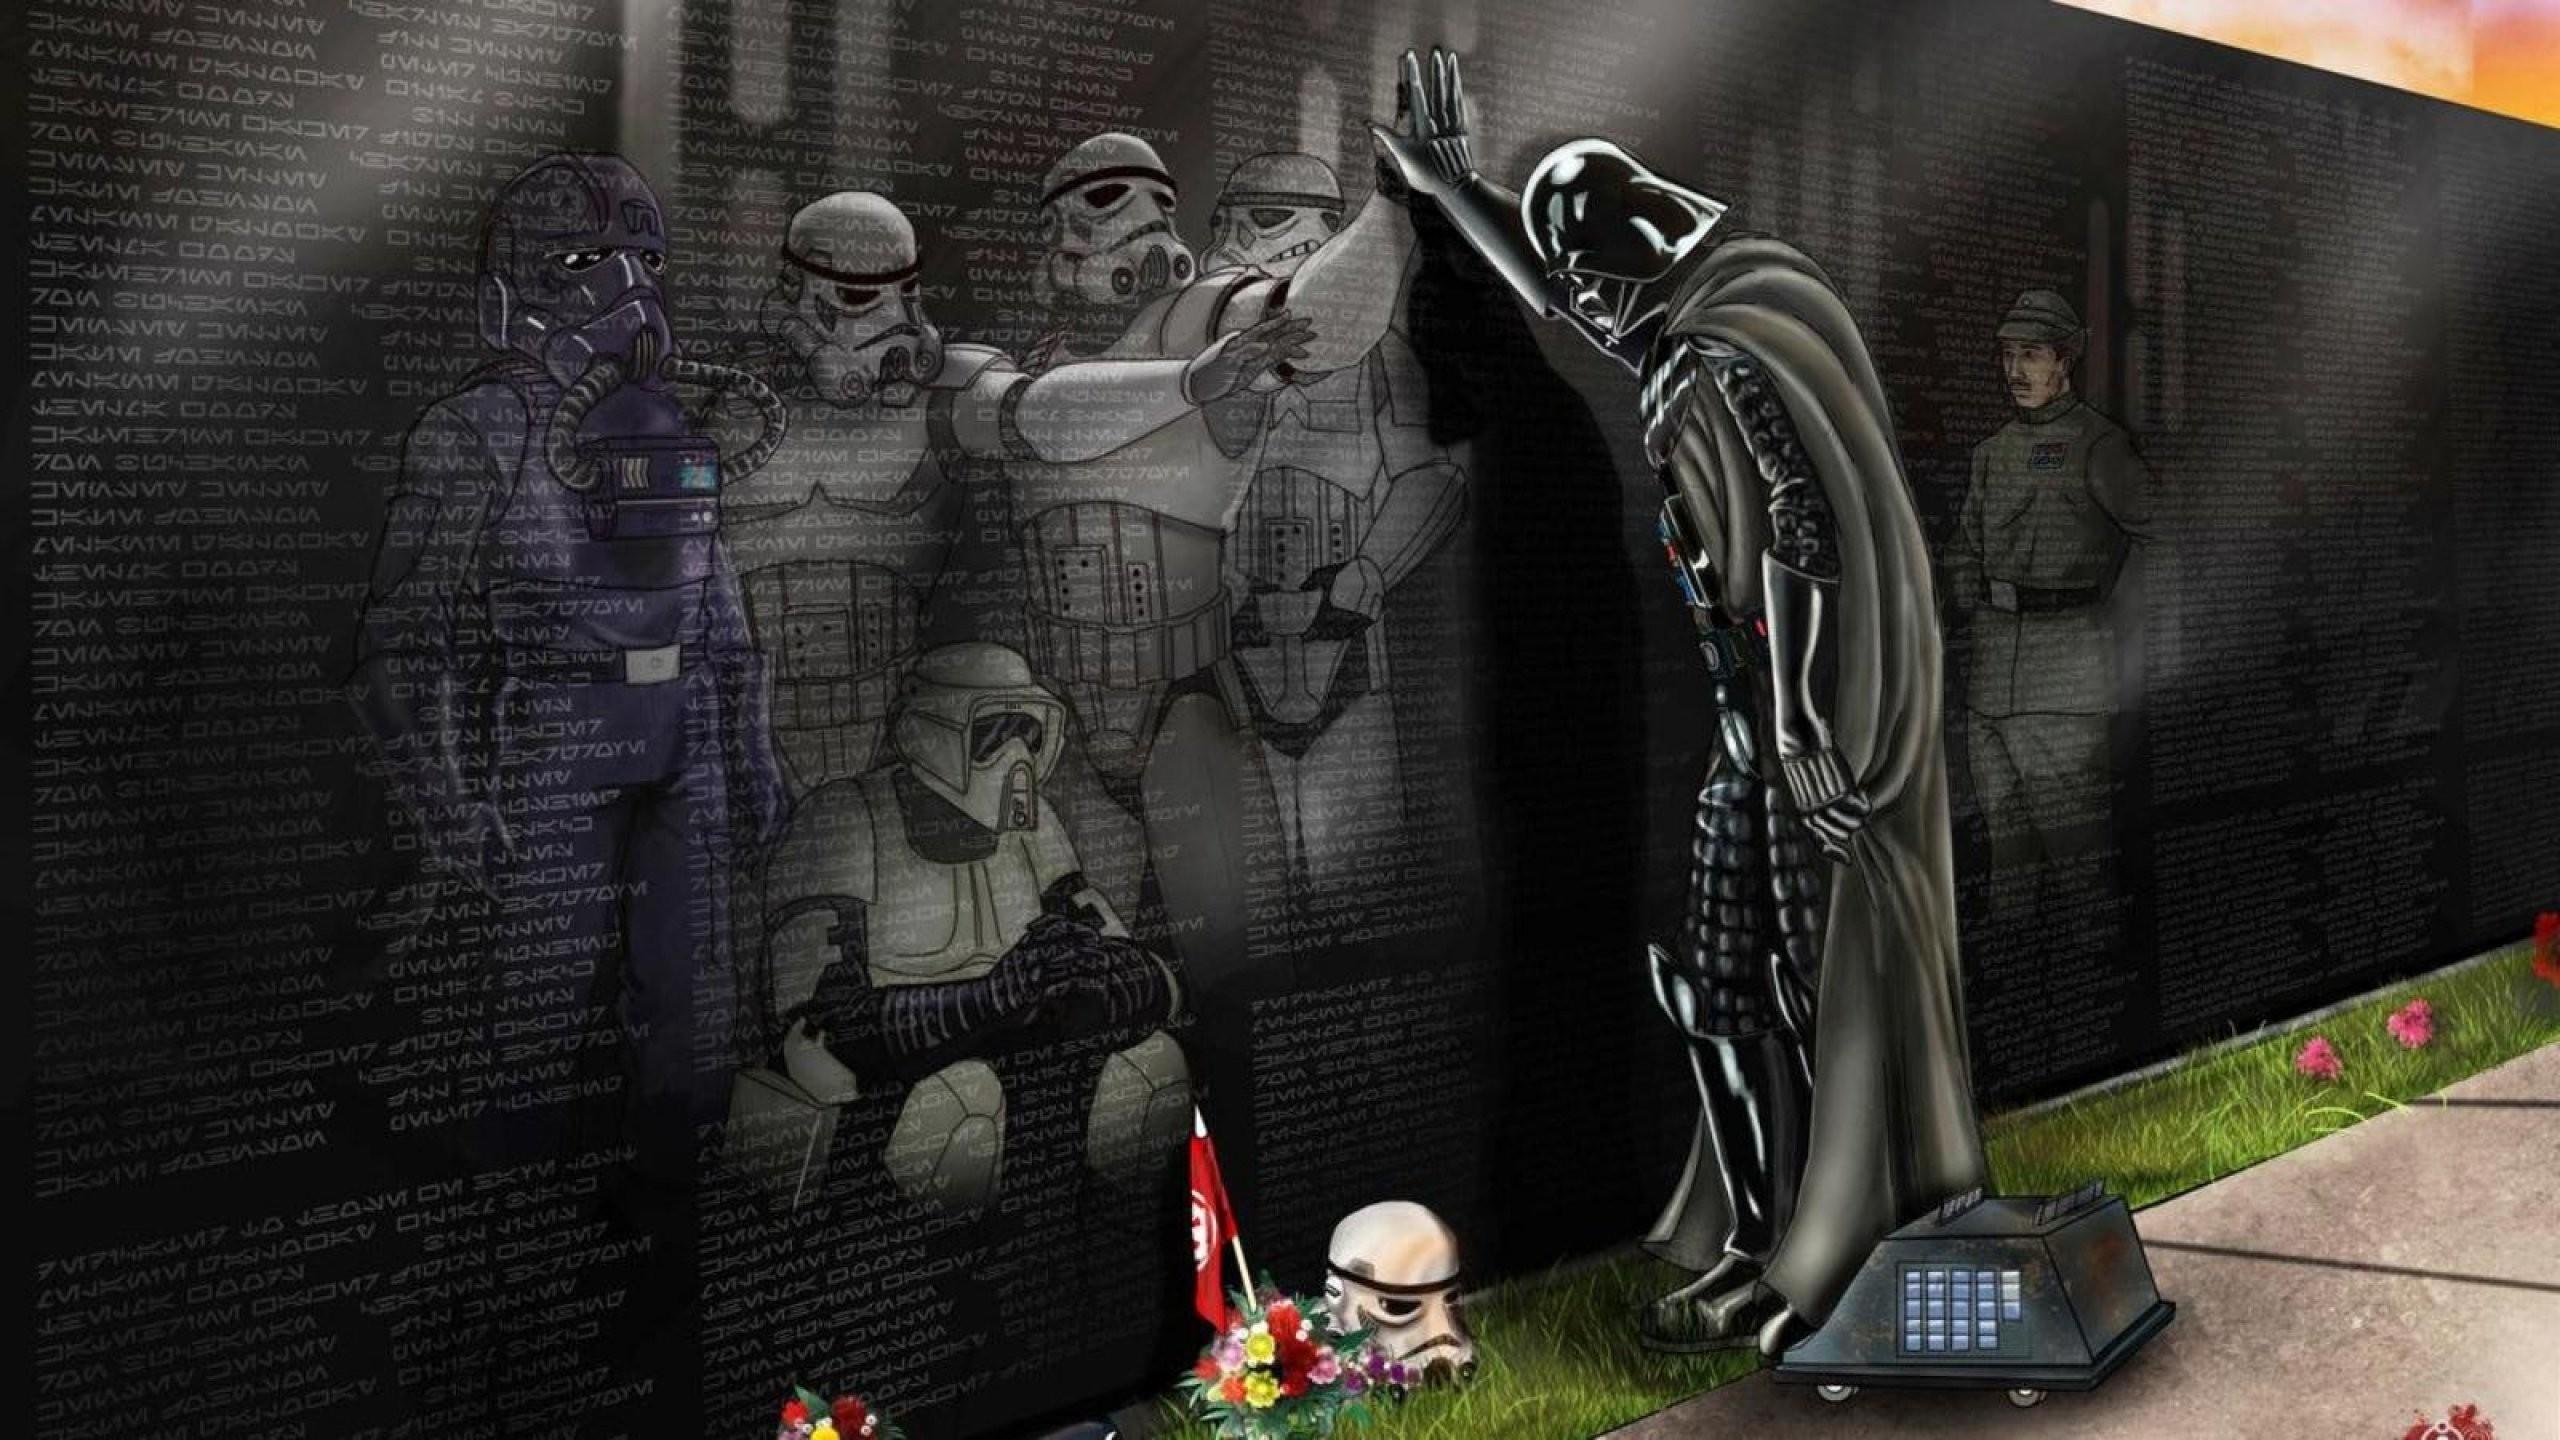 Download 5700 Wallpaper Darth Vader Lucu Paling Keren